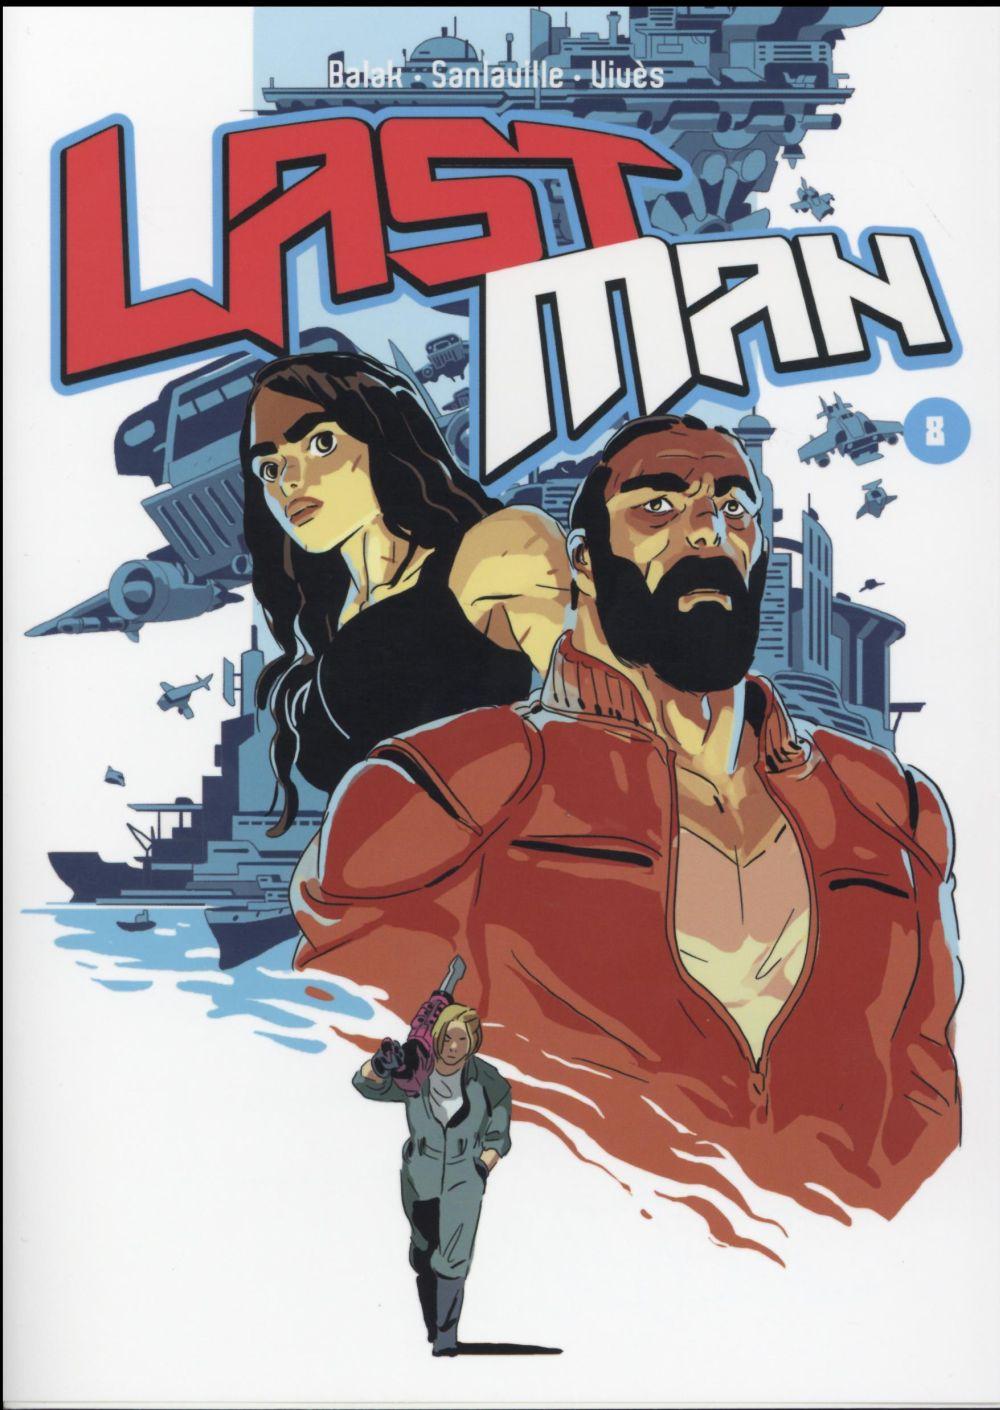 LASTMAN - T08 - LASTMAN BALAK/VIVES